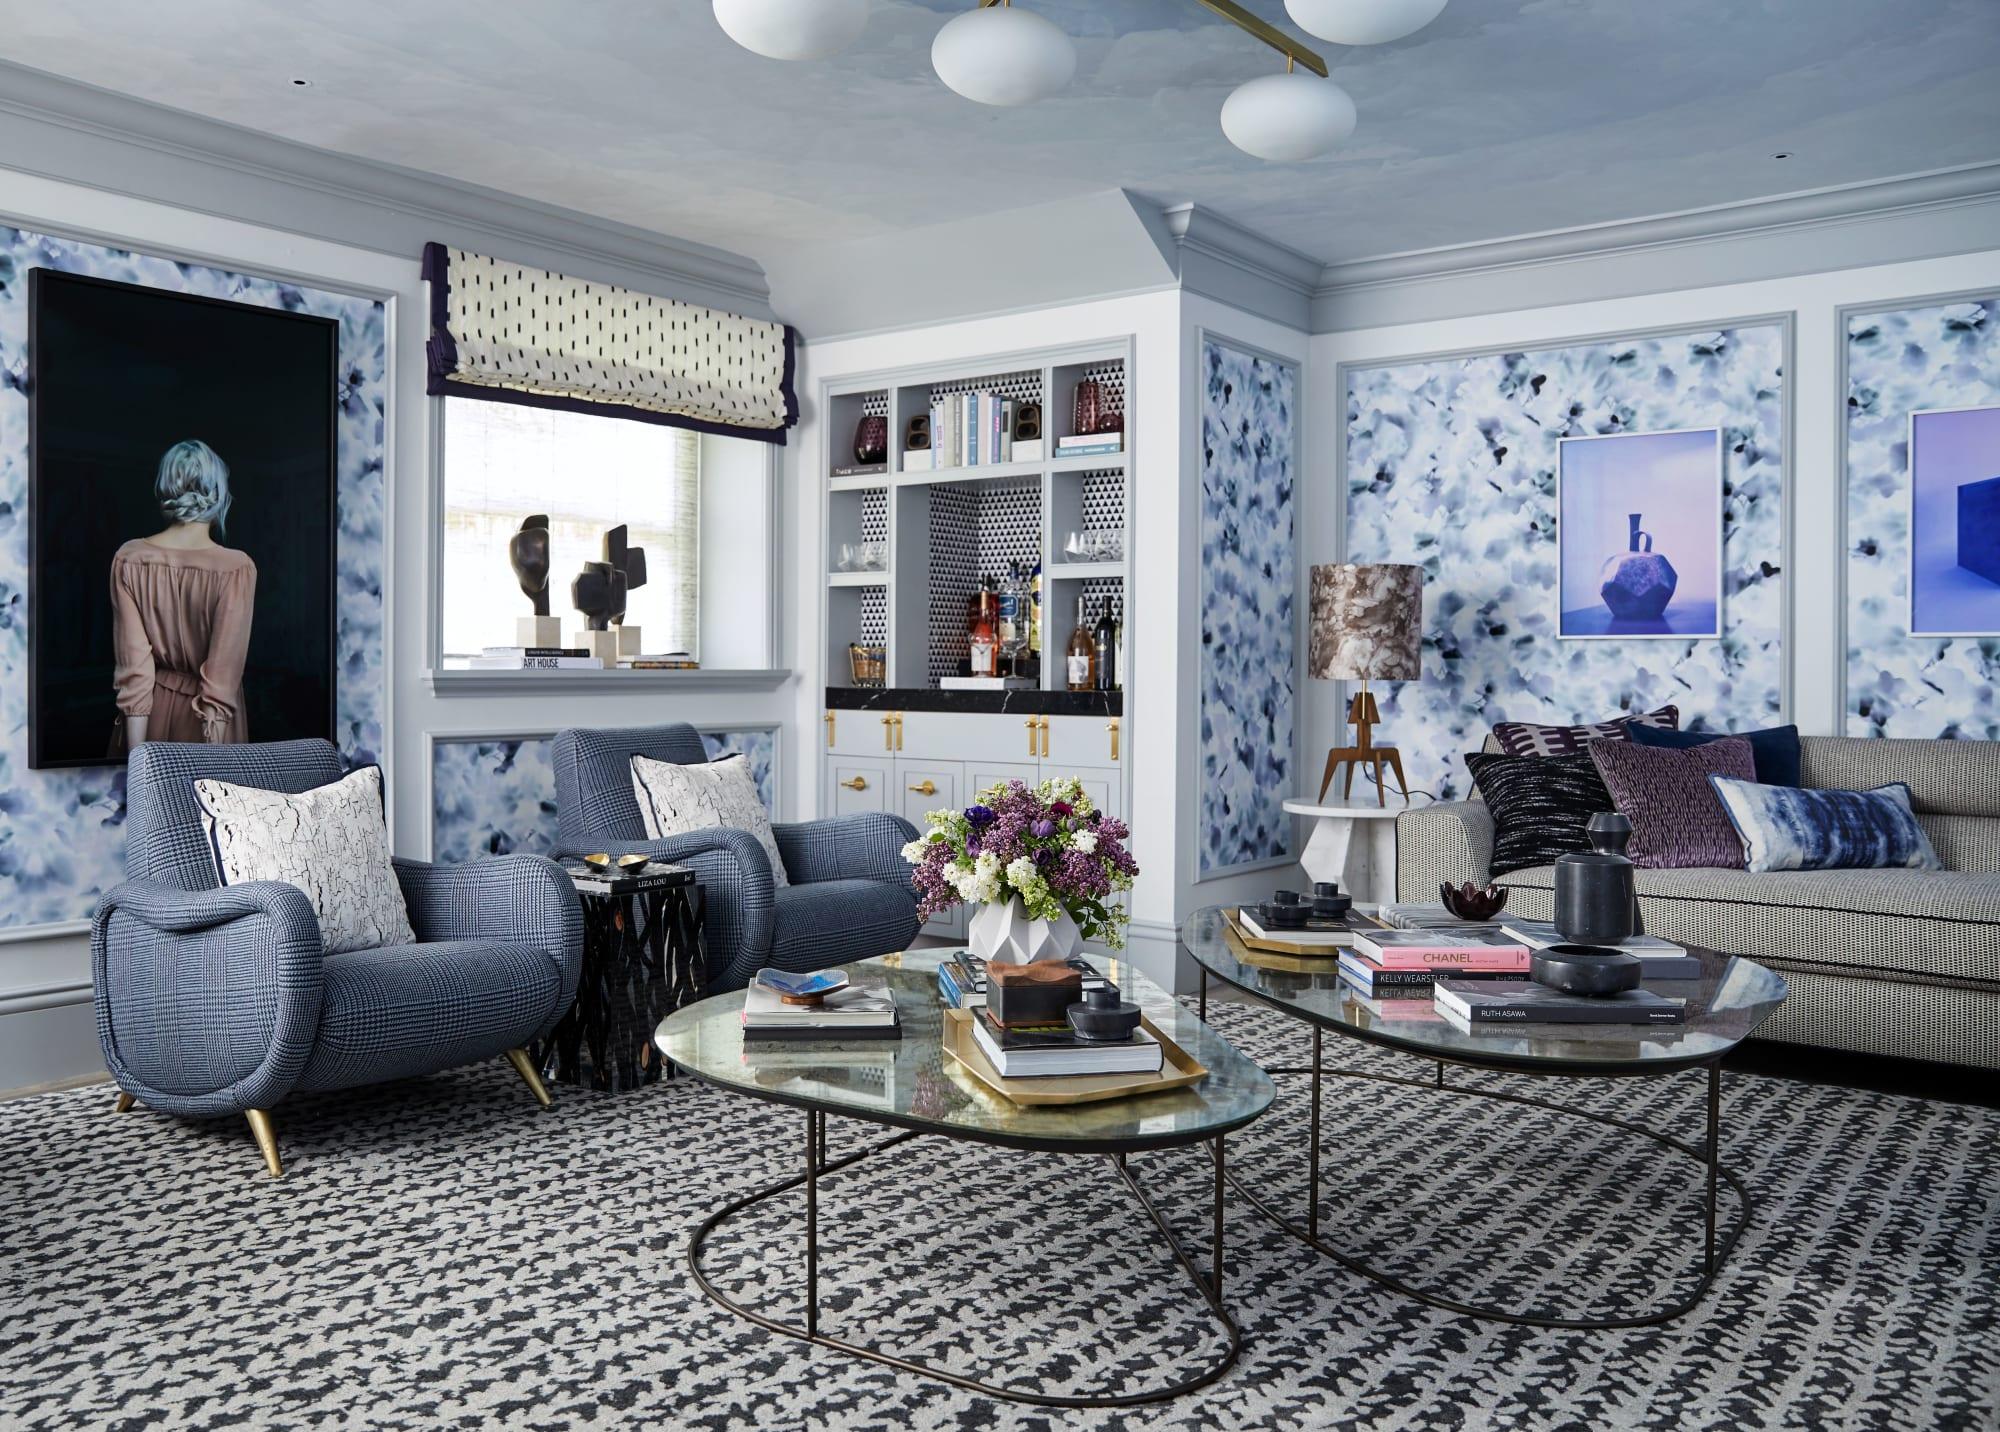 Interior Design by Kelly Hohla Interiors at SF Decorator Showcase 2019, San Francisco - SF Showcase House